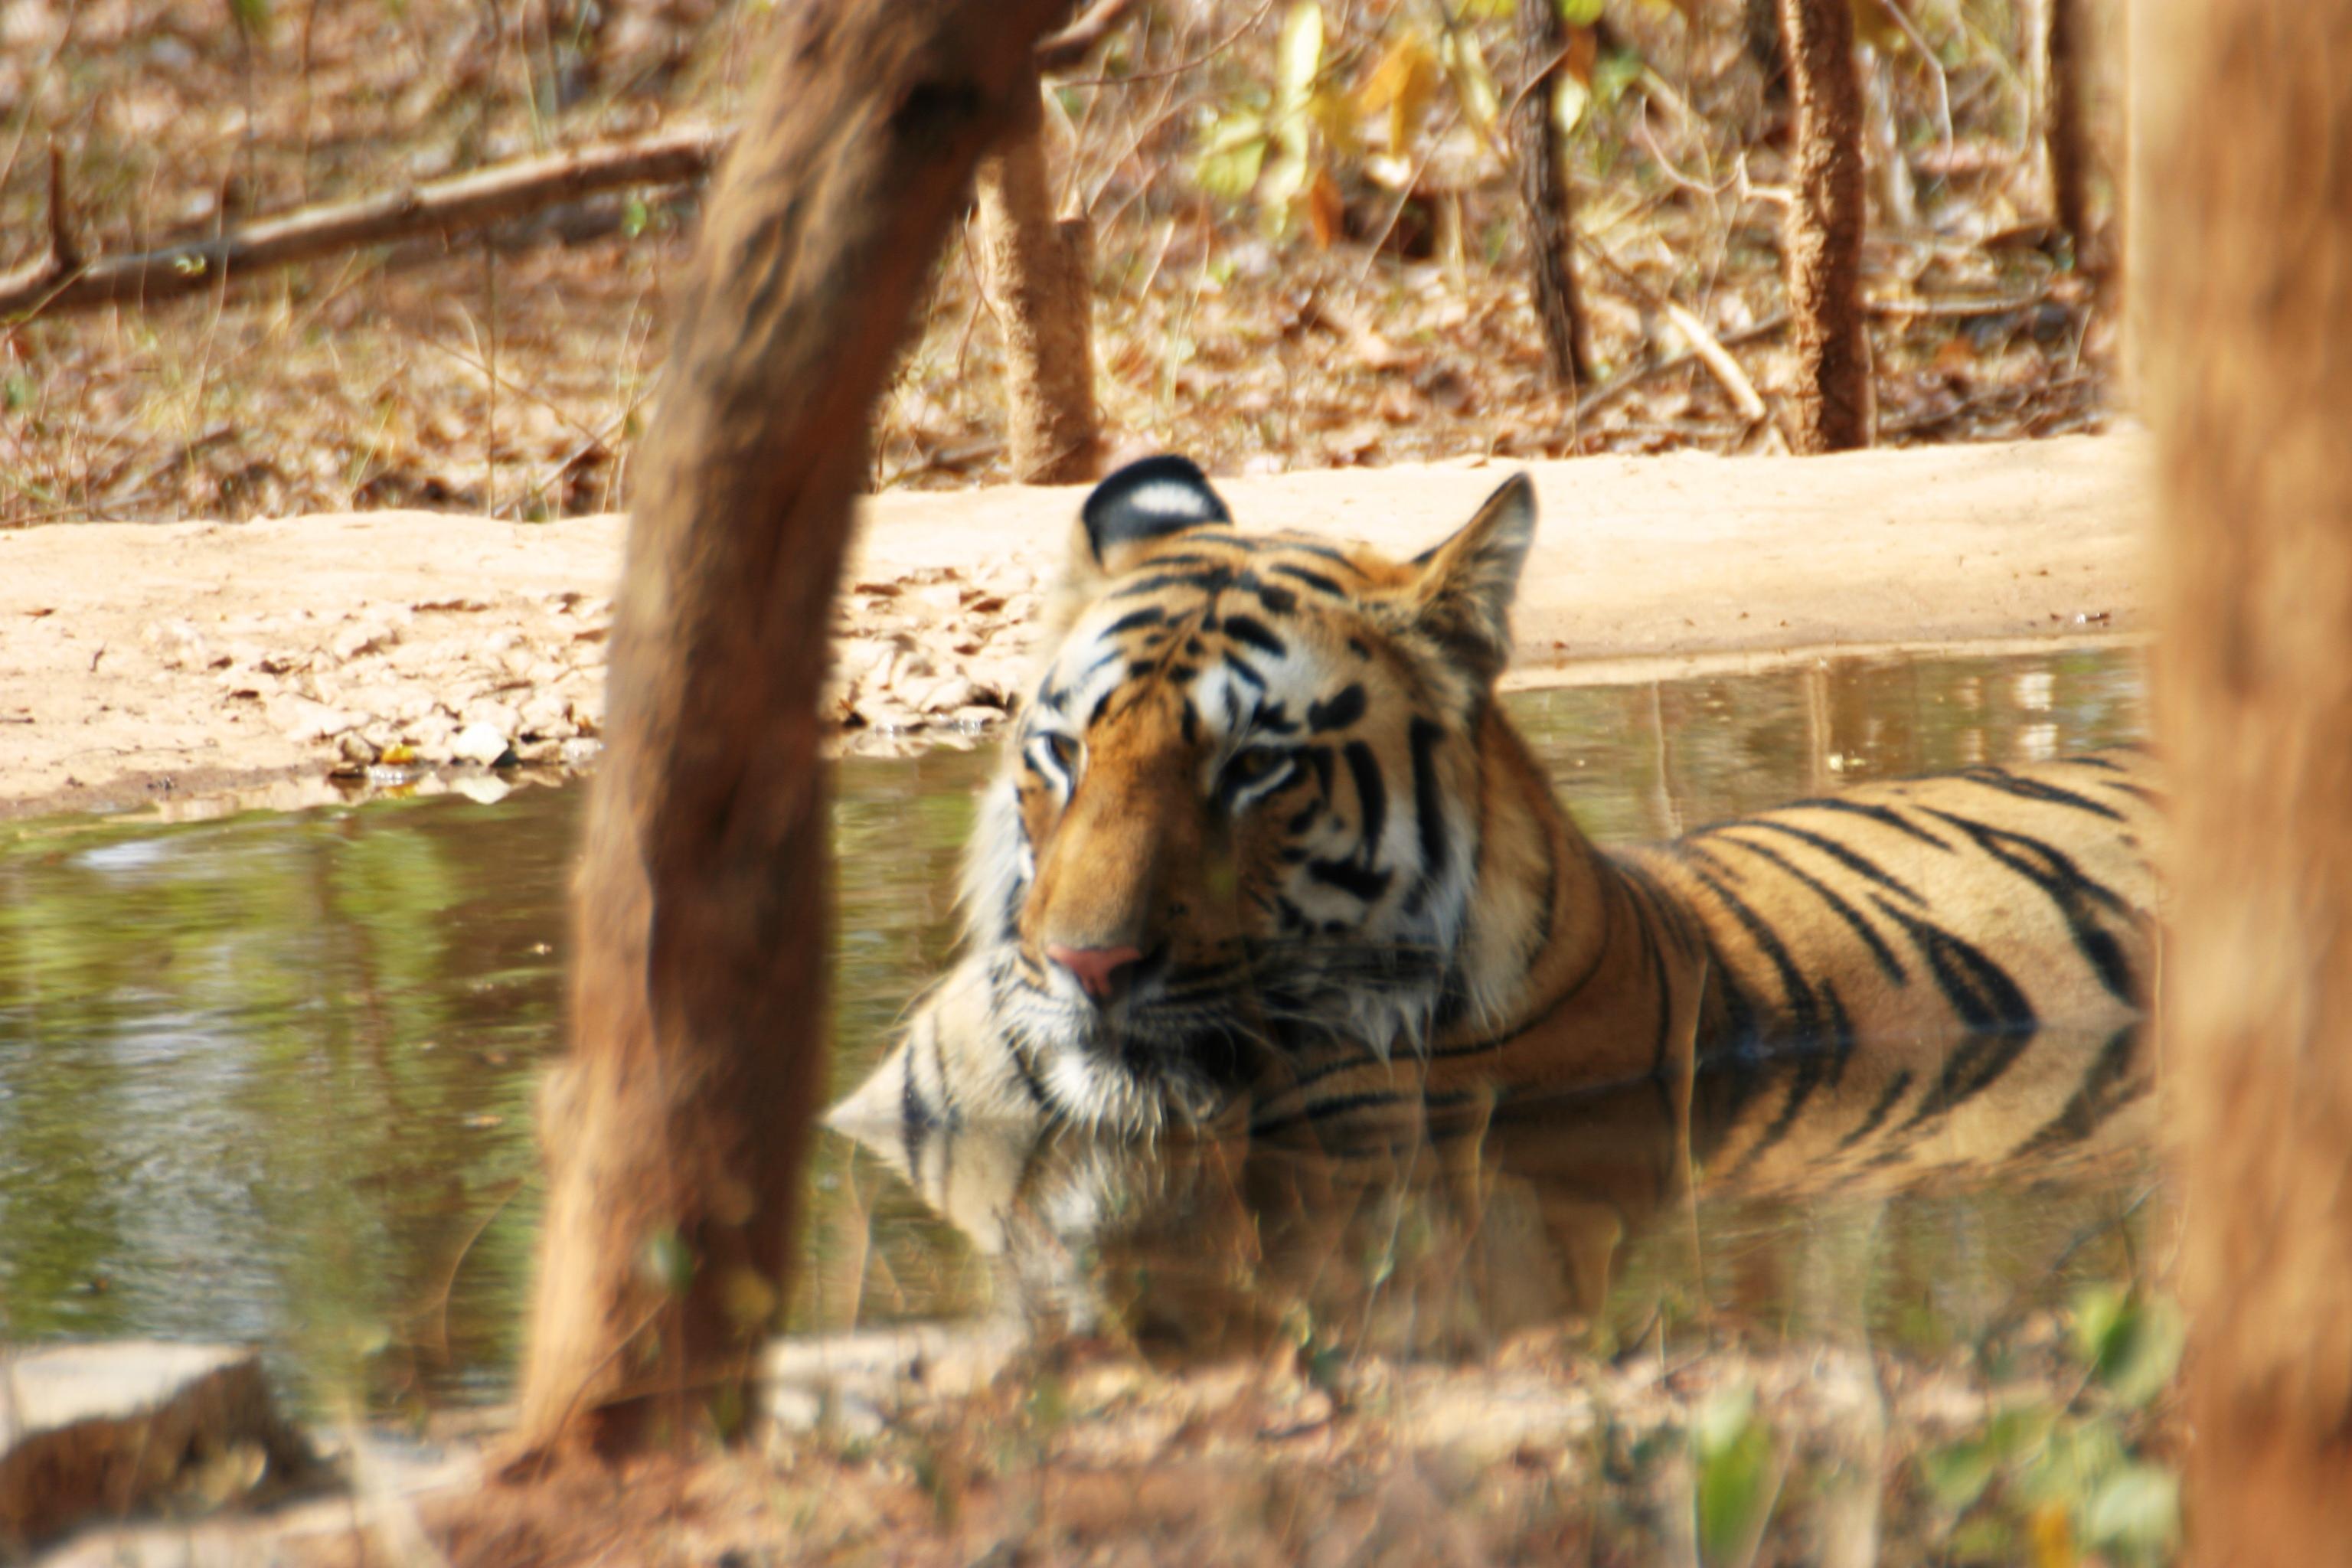 File:Bandhavgarh Tigers 3.jpg - Wikimedia Commons